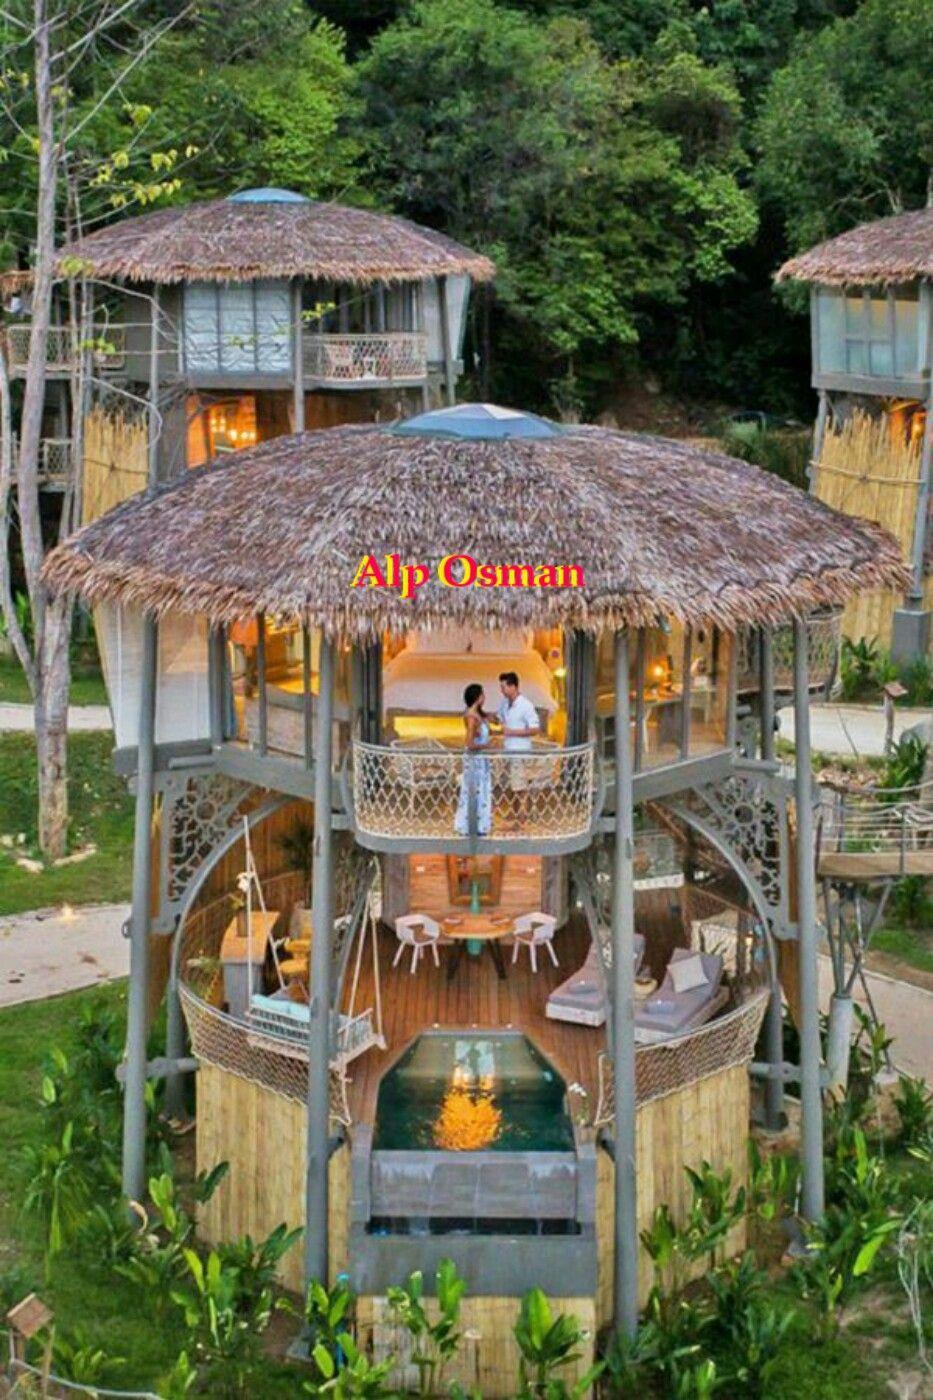 Pin By Konuralp Alperkagankarakoc On Küçük Ev Modelleri Tiny Houses Little Cabin Treehouse Villas Bamboo House Design Resort Architecture